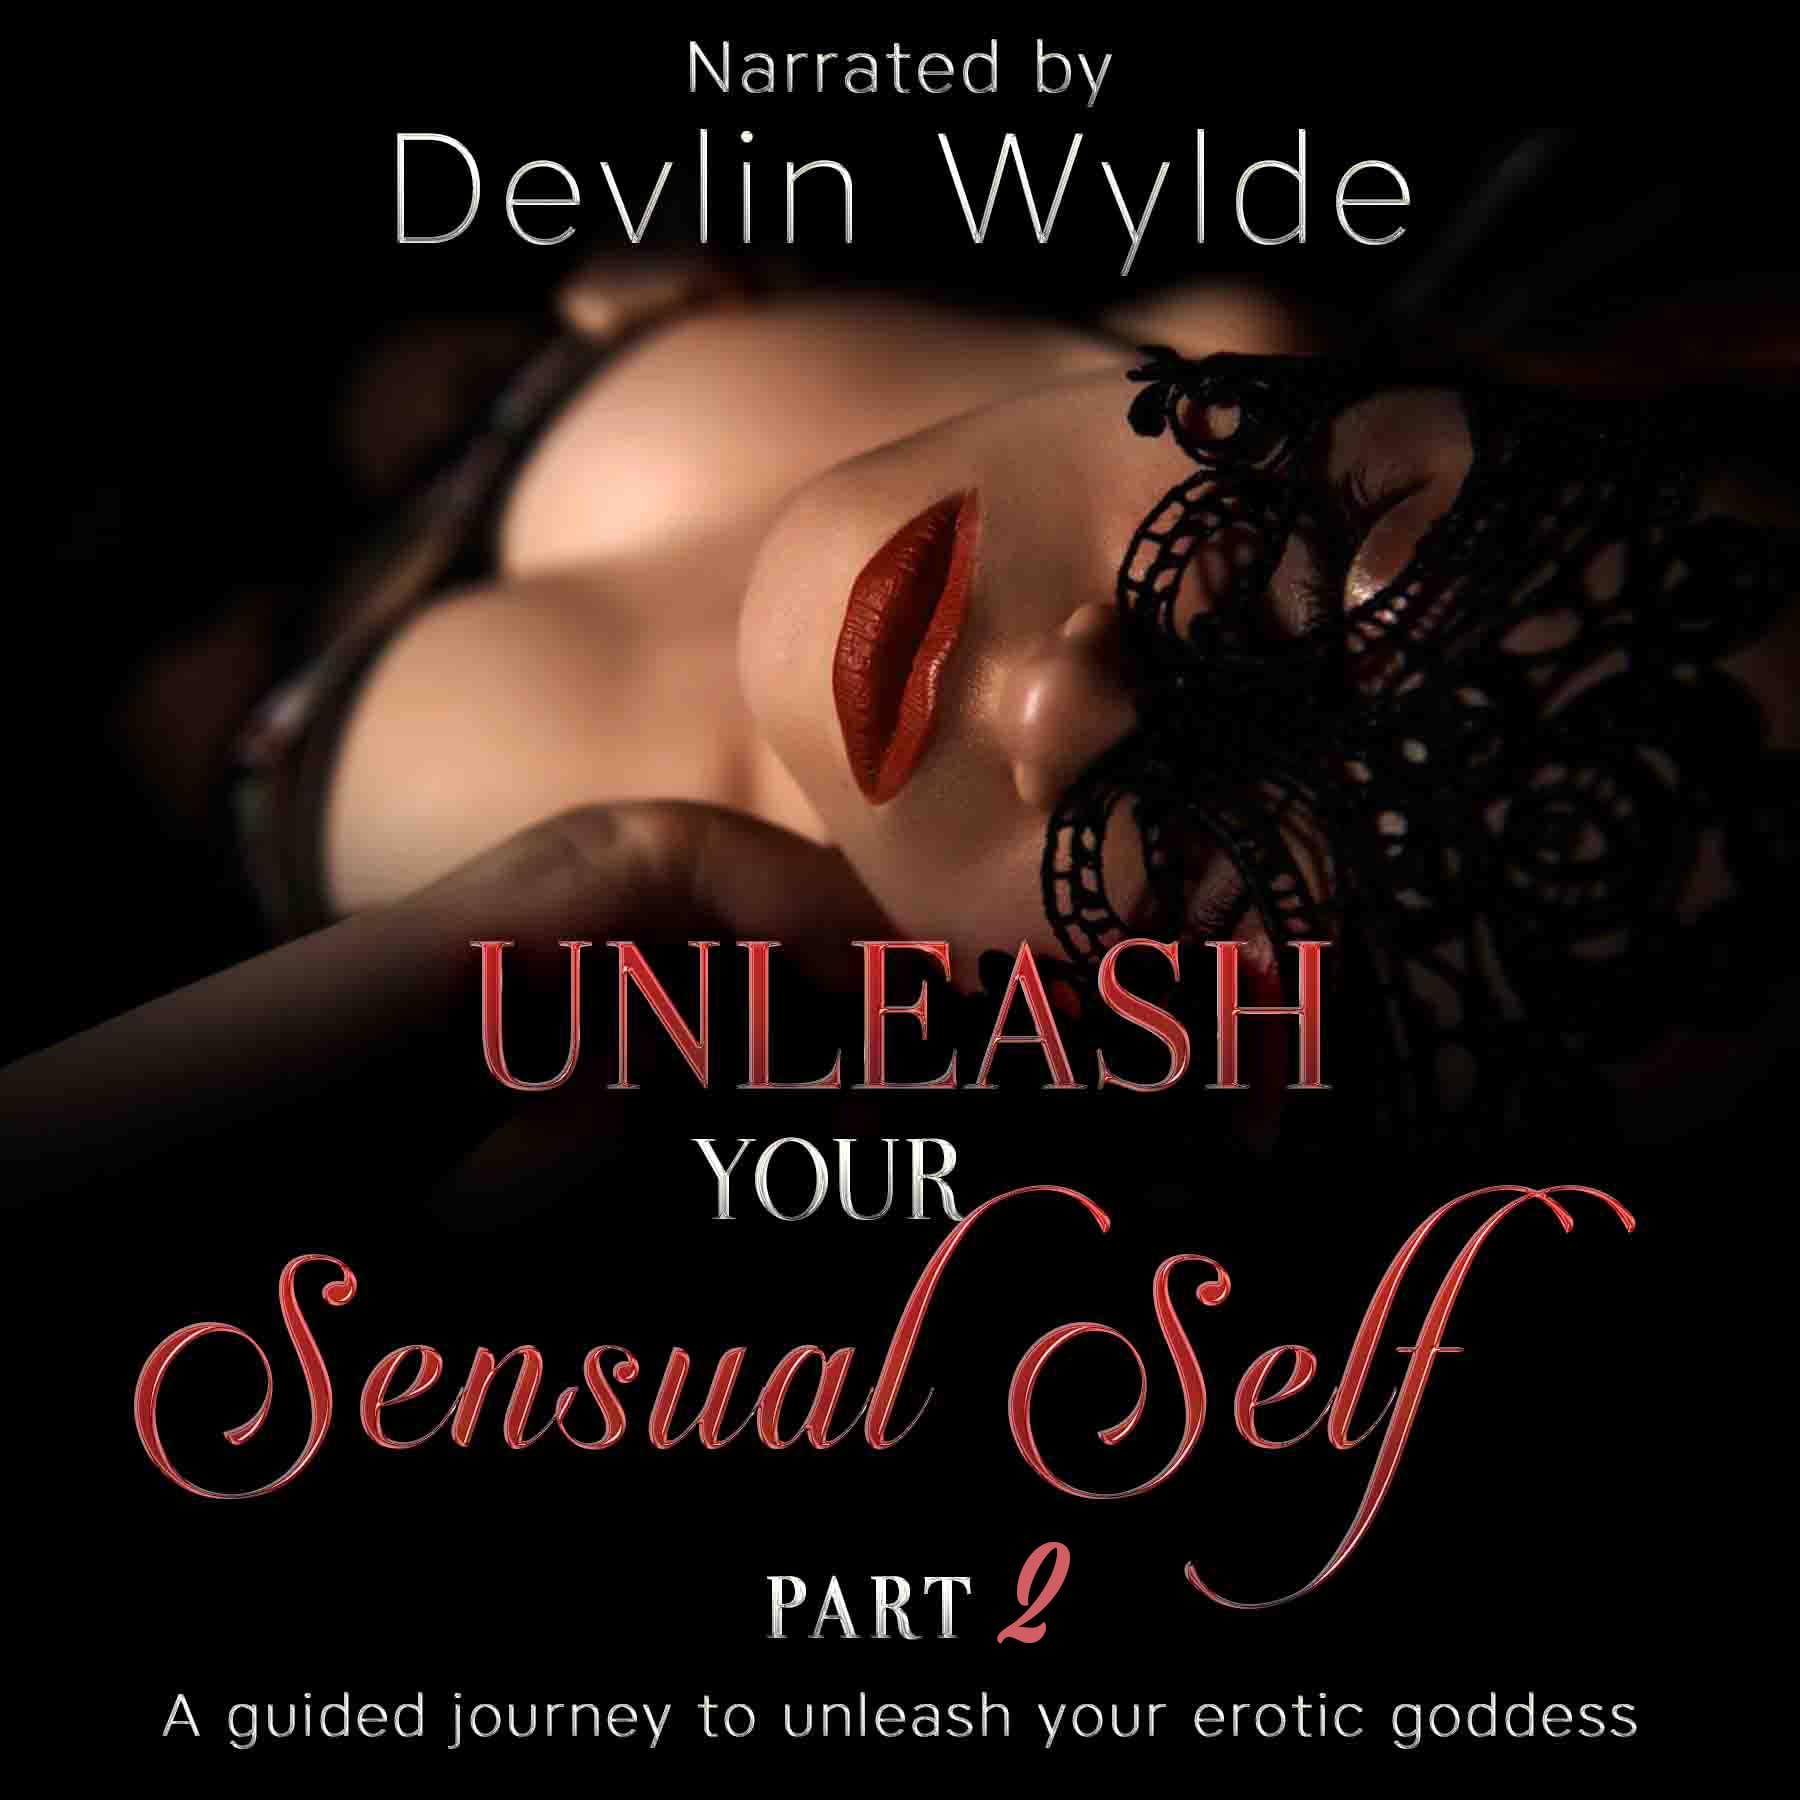 Erotic Audio-Unleash your sensual self - thank you 2